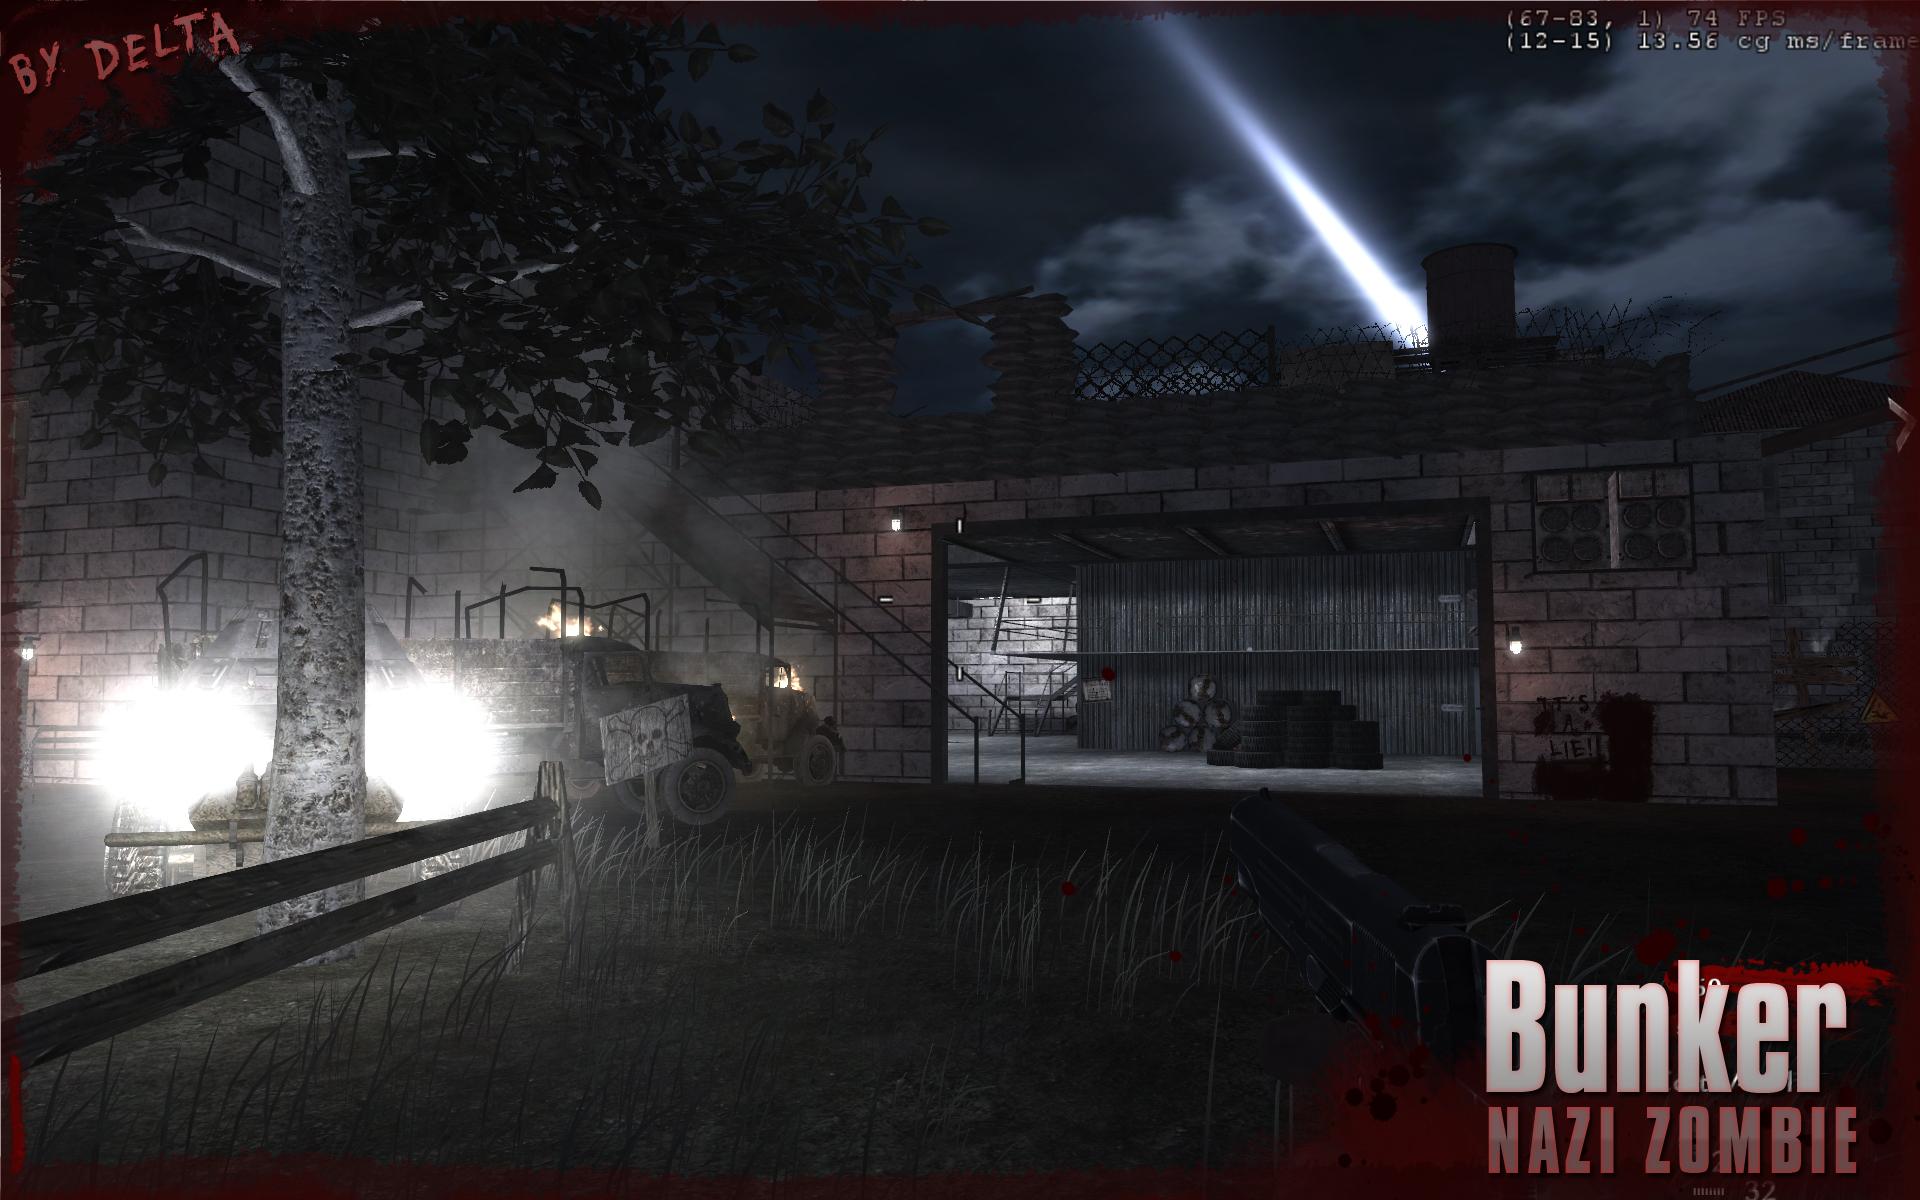 CoD WaW - Nazi Zombie Bunker | Alexander Diller